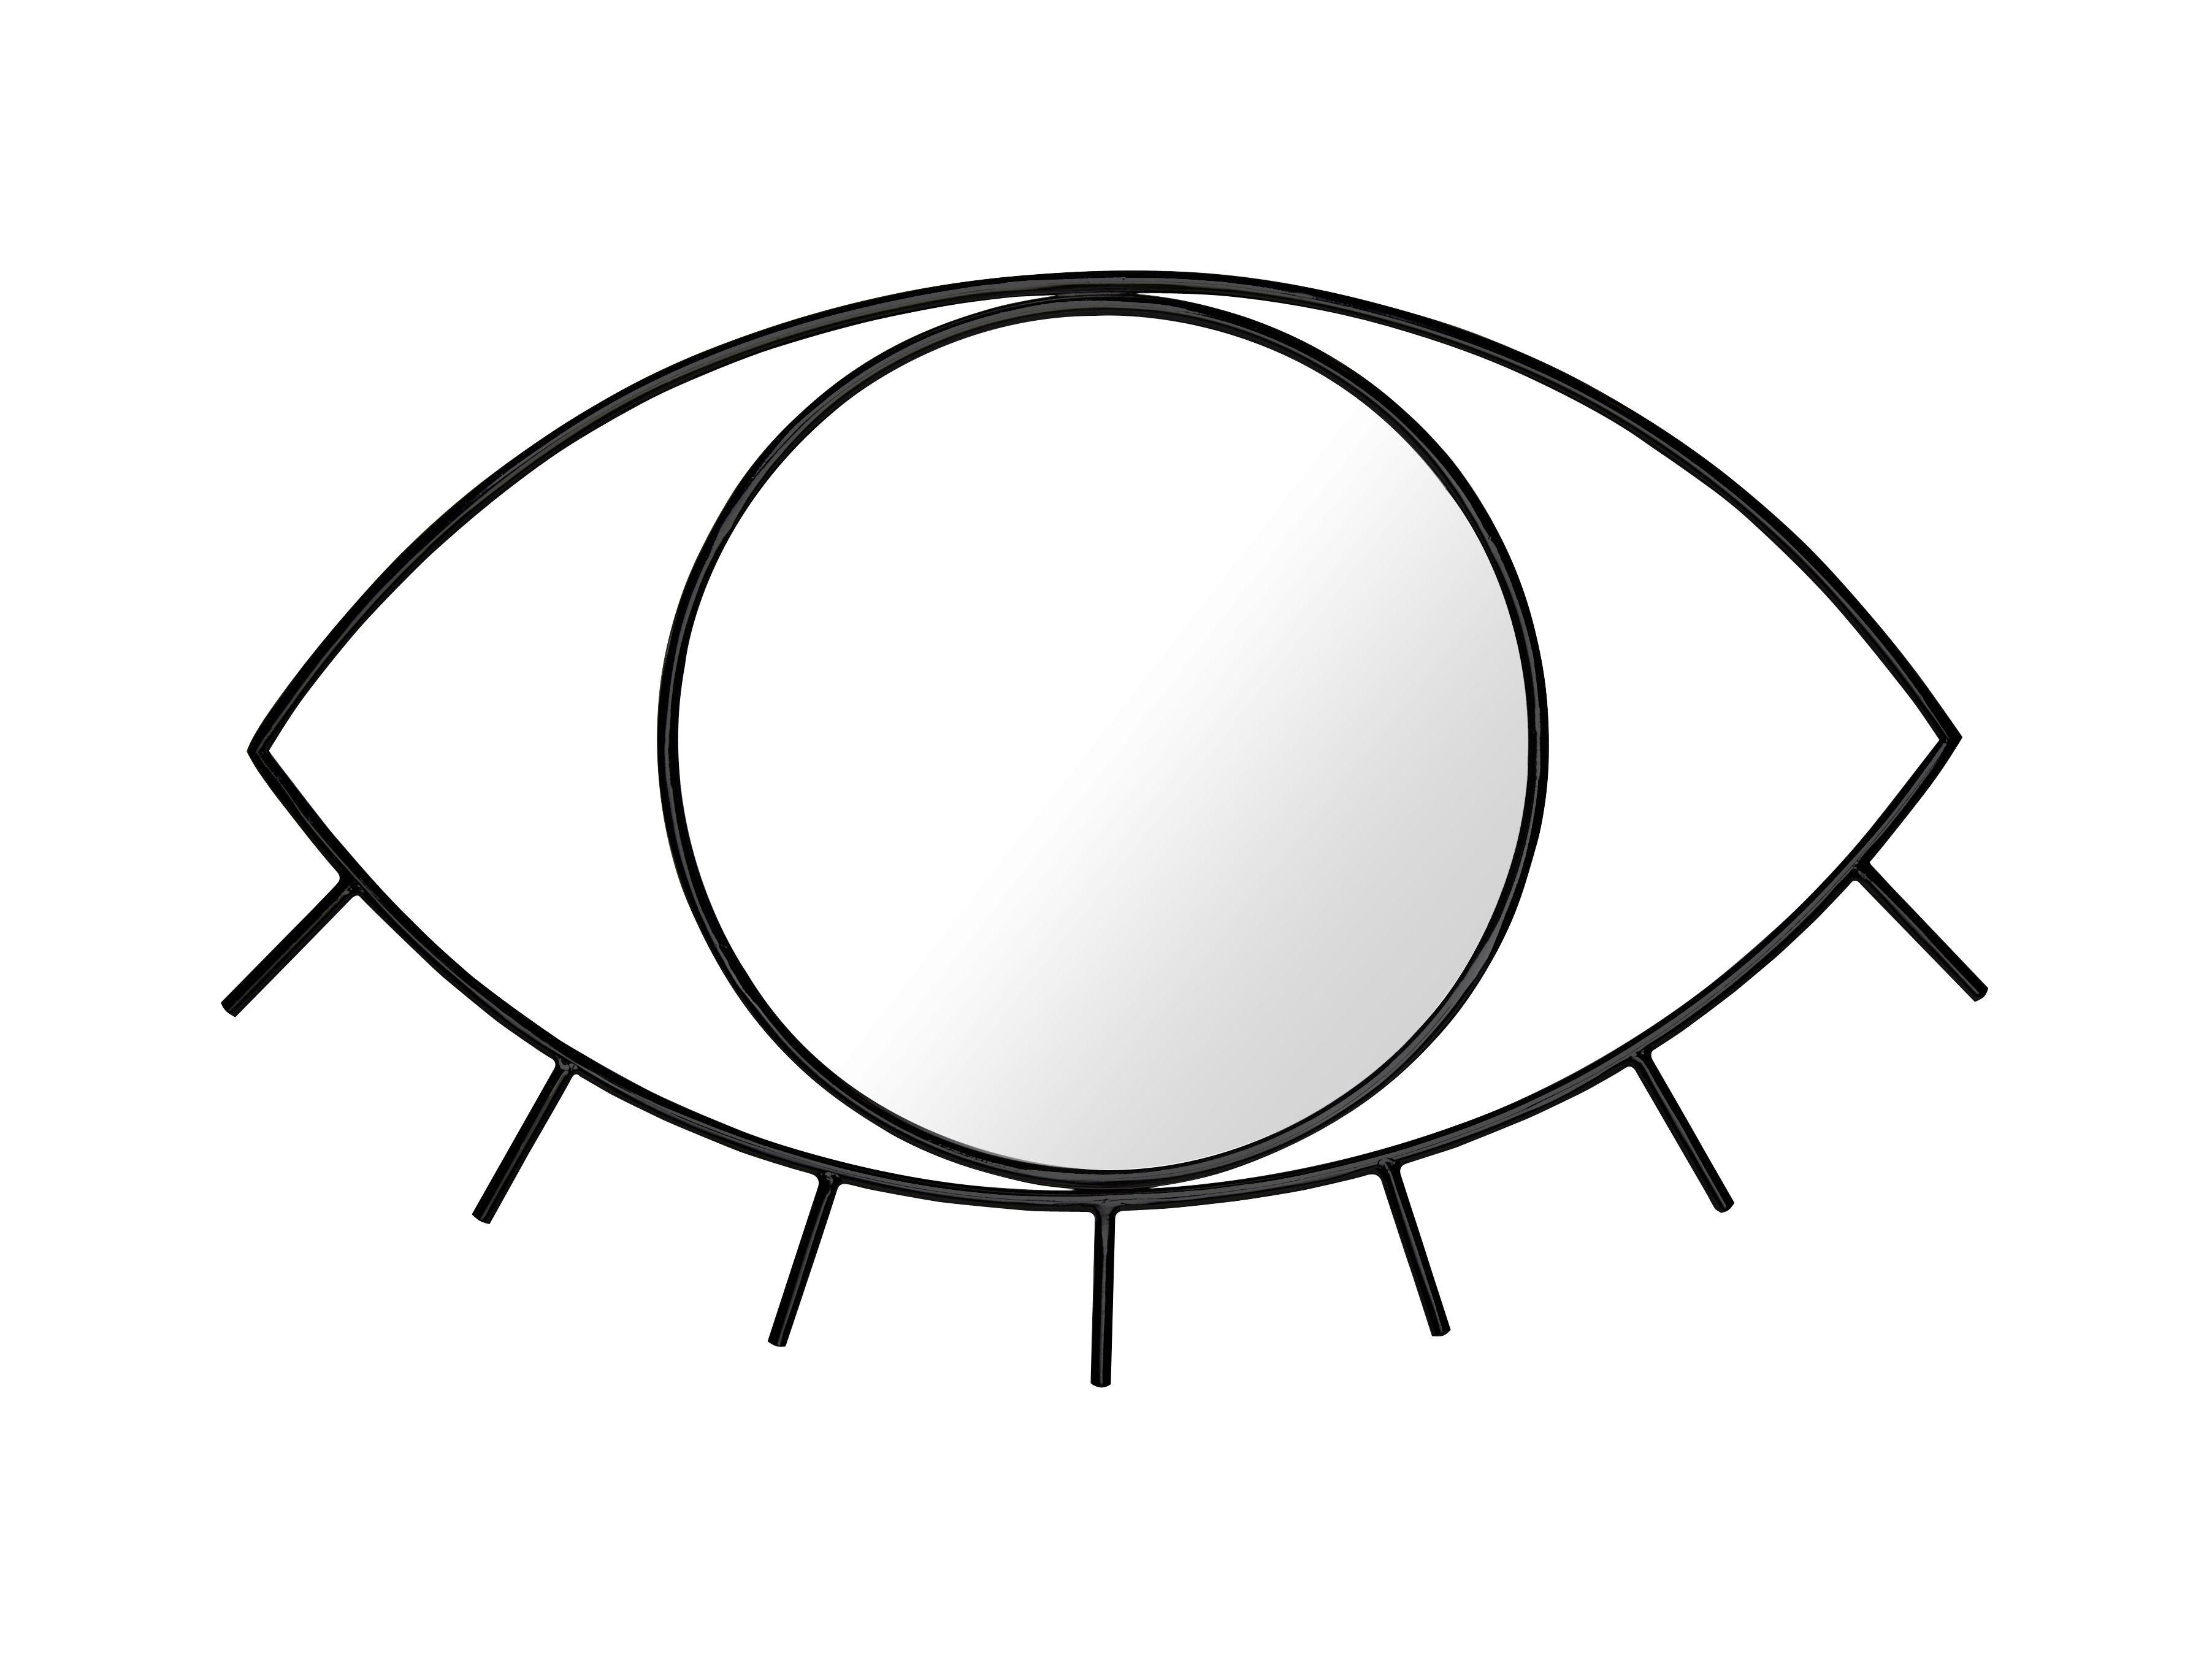 Interni - Specchi - Specchio murale Cyclops Medium - / L 43 x H 28 cm di Doiy - Medium / Nero - Metallo, Vetro